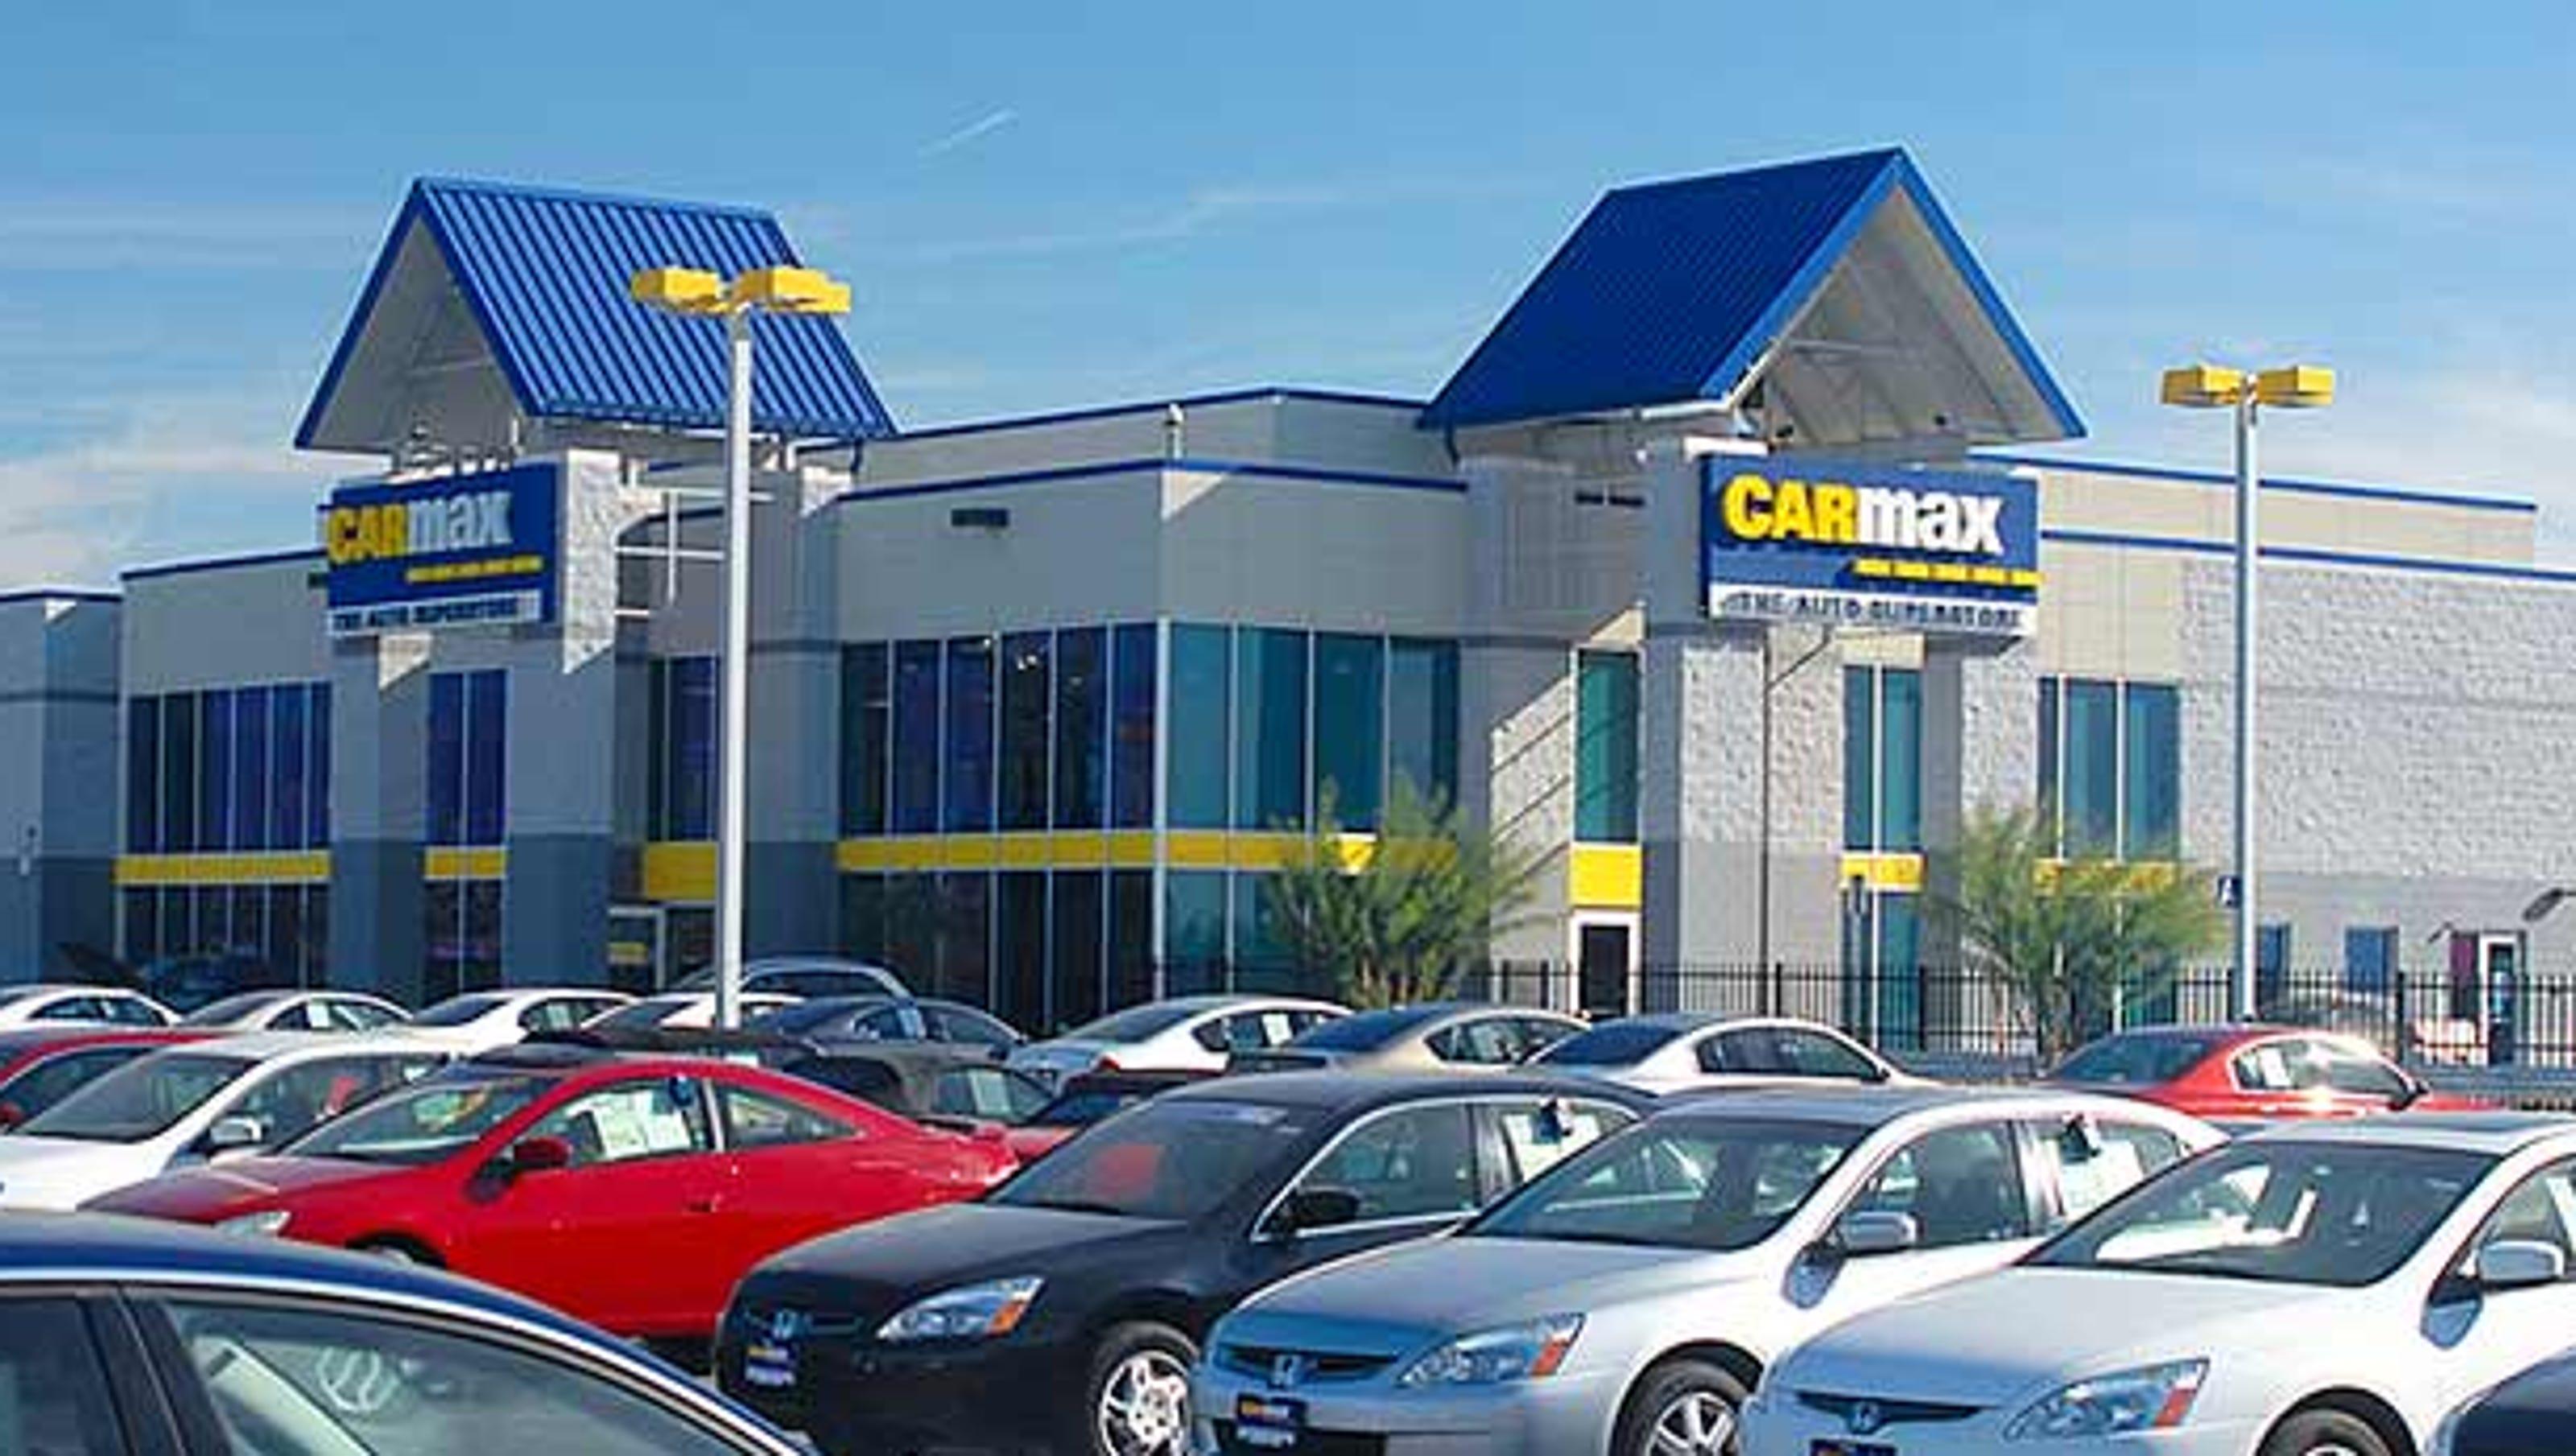 Carmax Hiring For 25 Jobs Near Newark